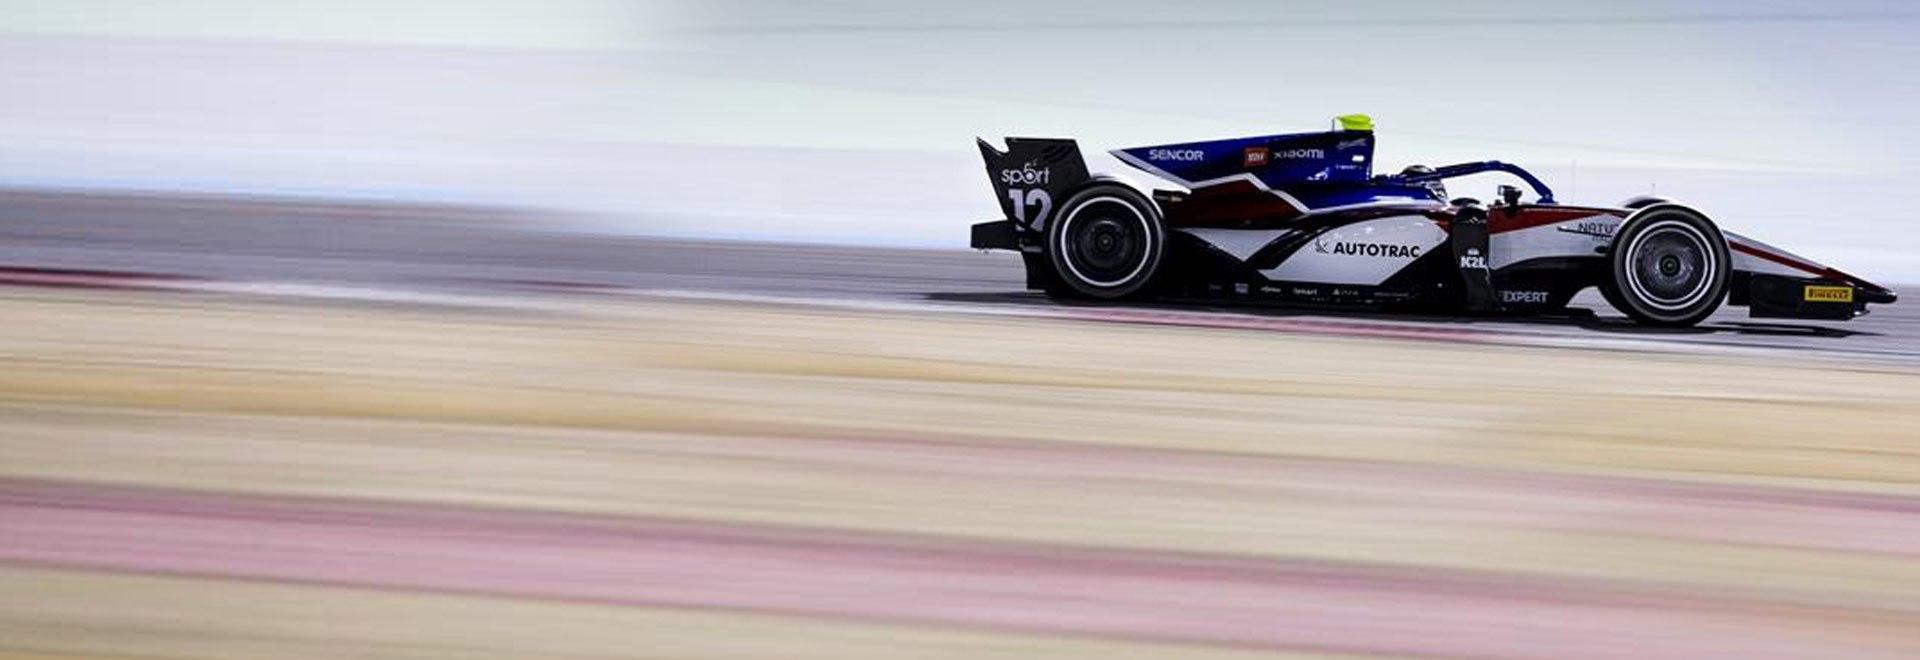 GP Ungheria. Sprint Race